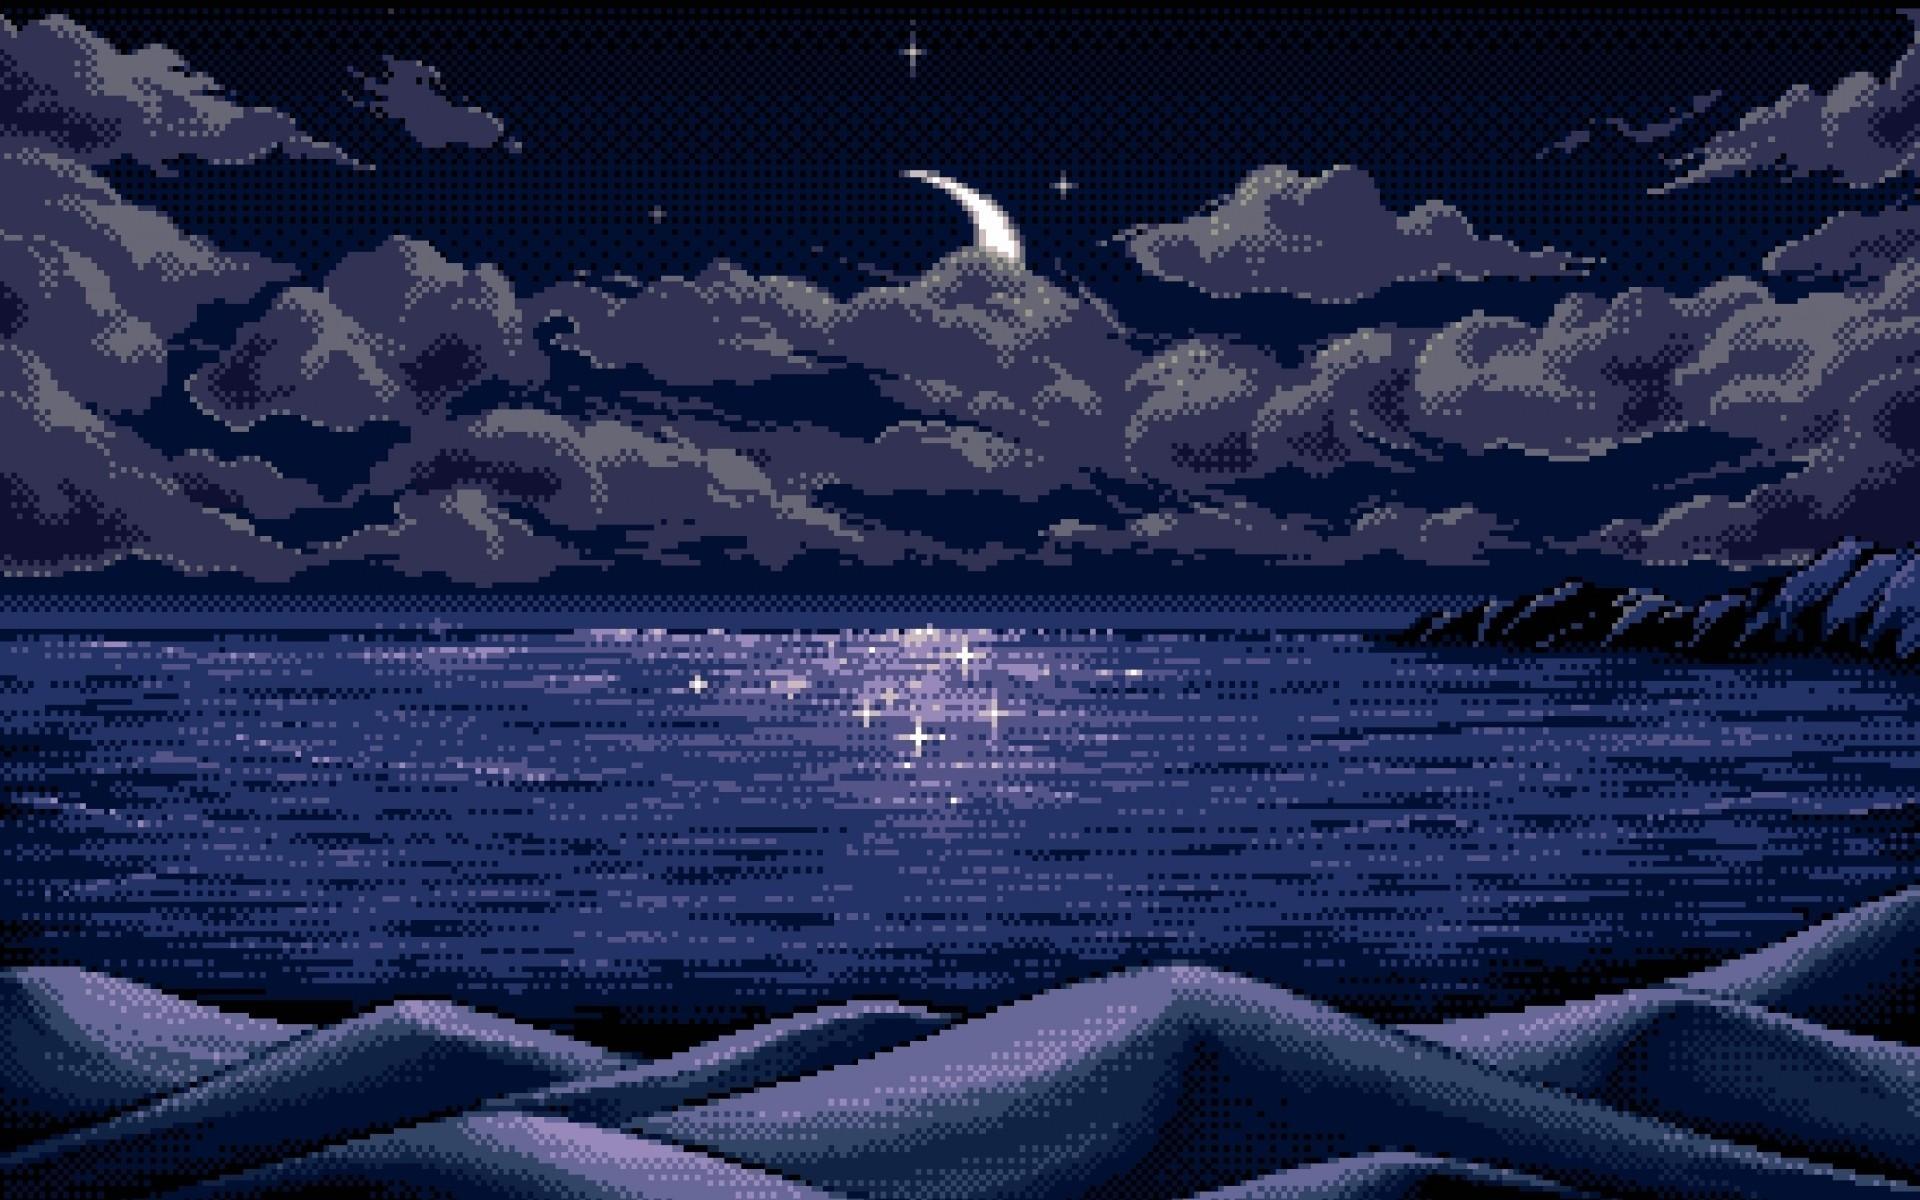 Wallpaper : landscape, mountains, digital art, sea, night